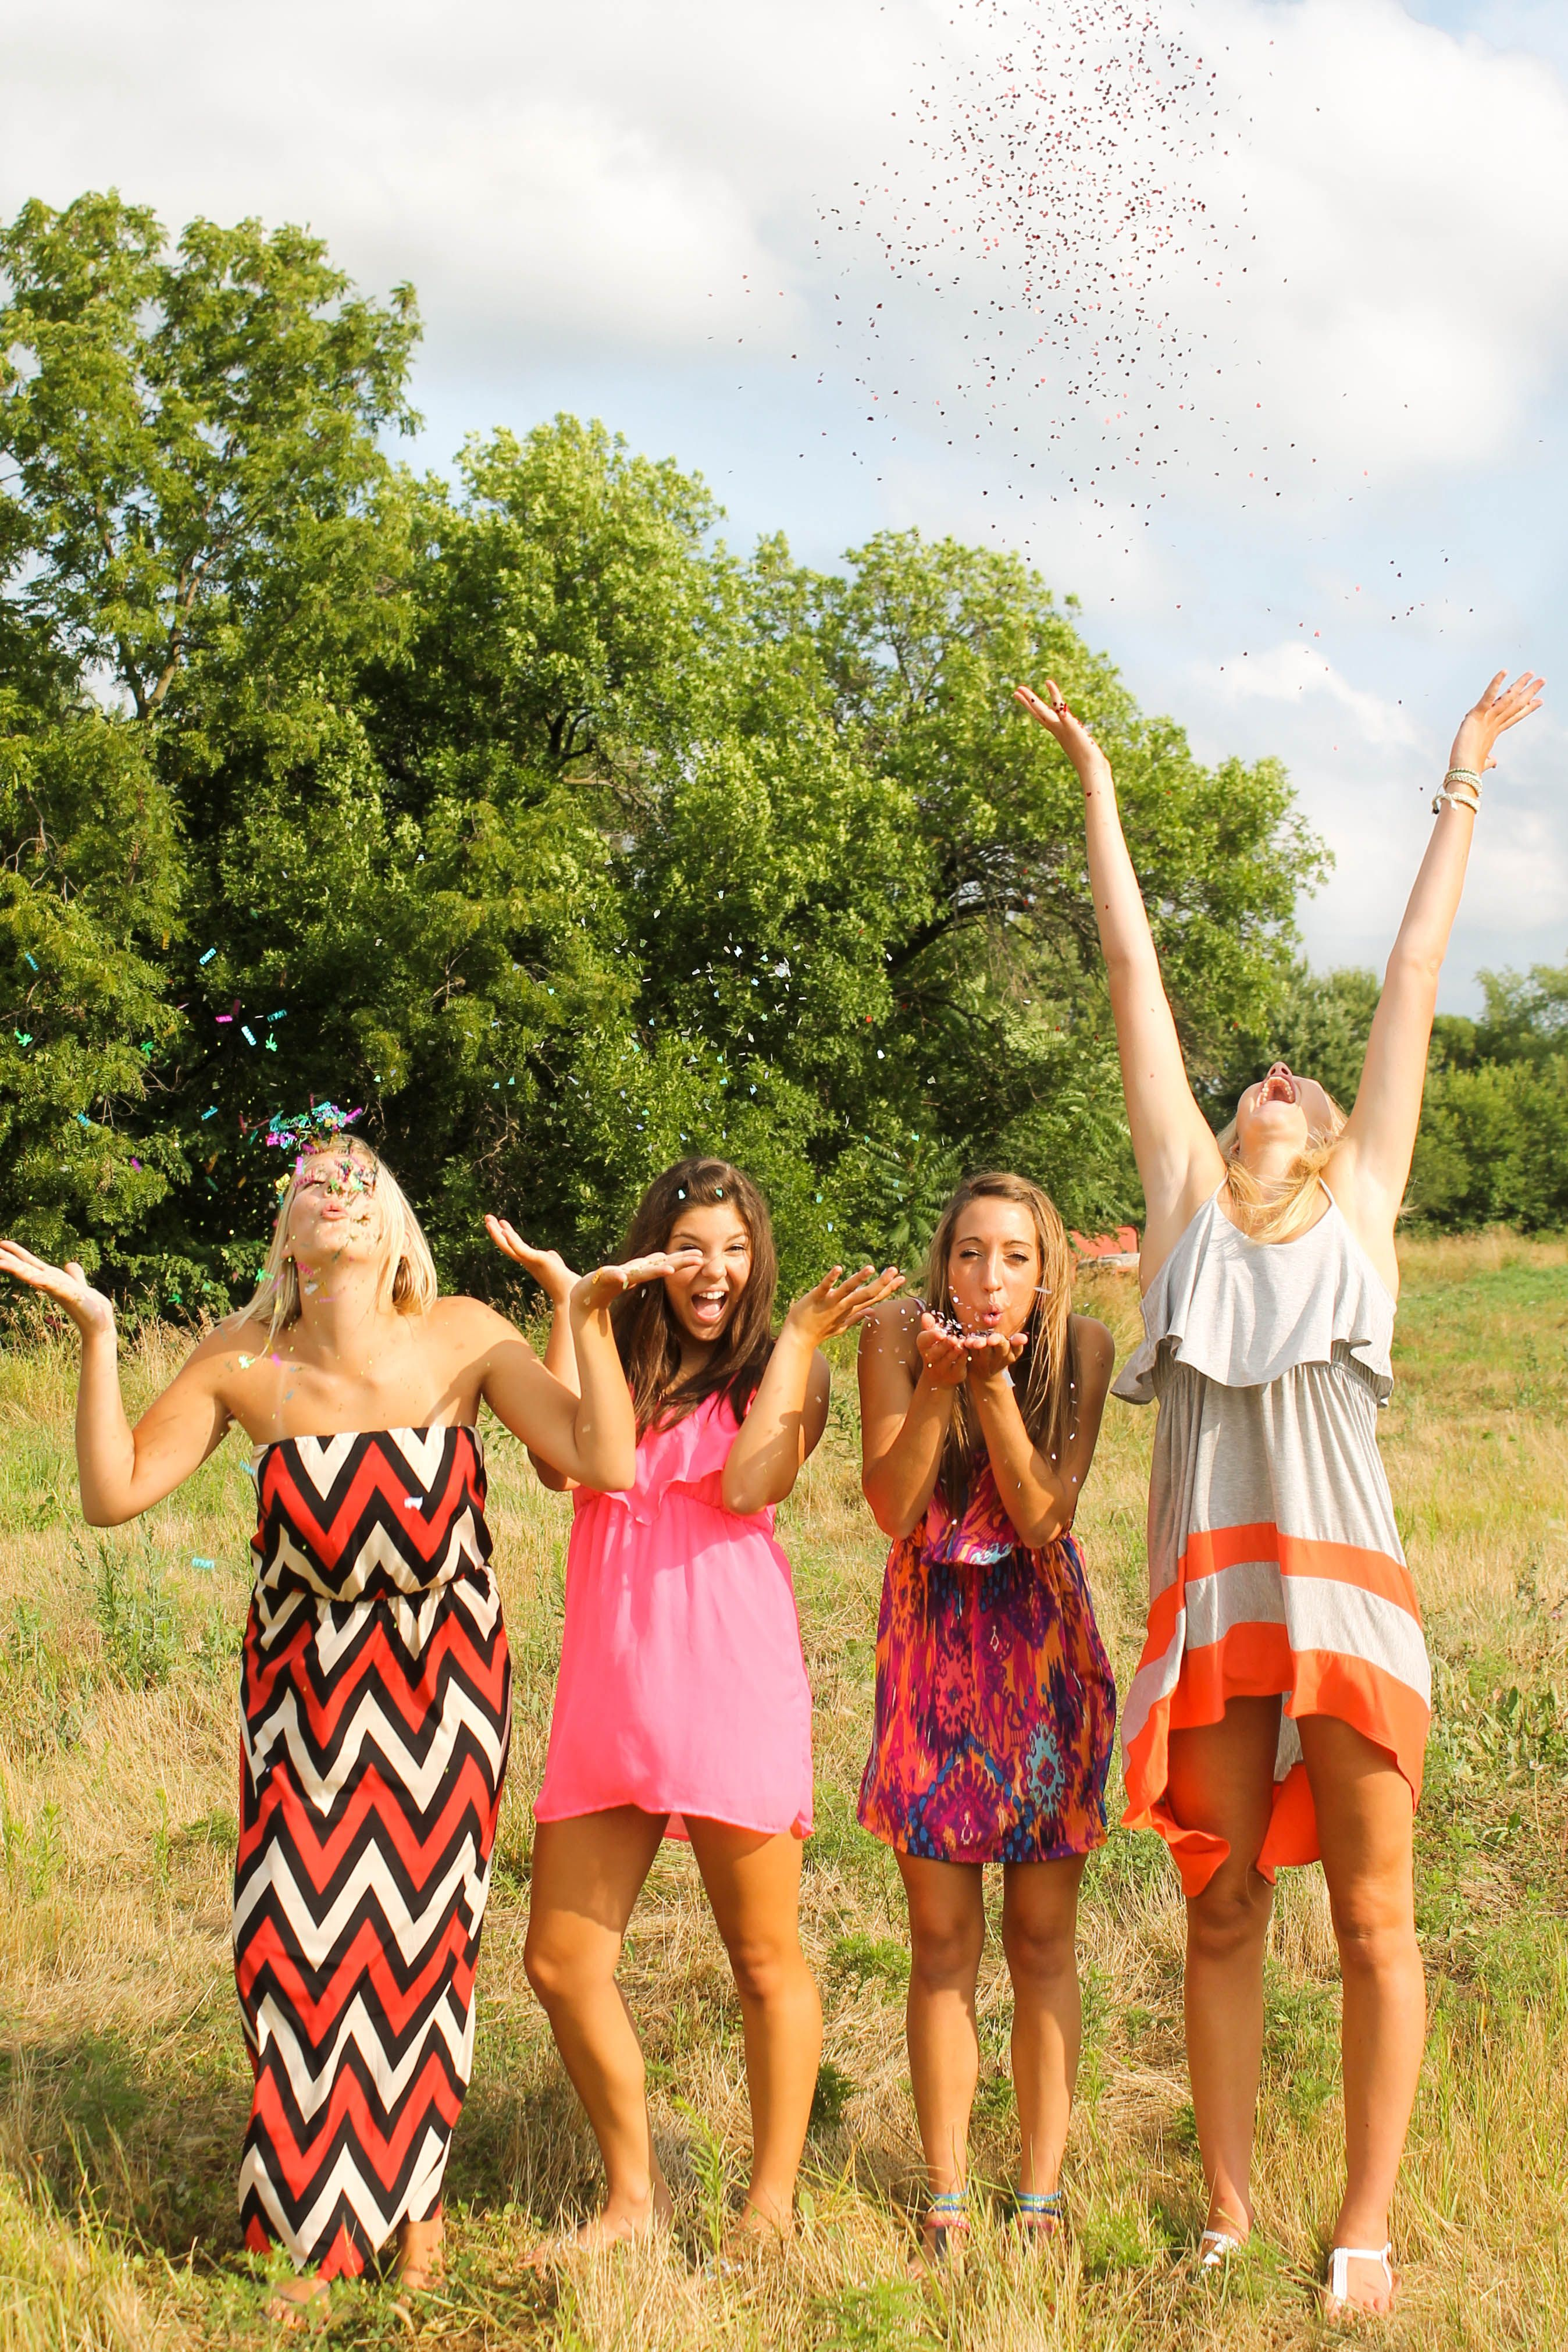 {Teen Photography} Best Friend Pictures - Confetti - 4 Best Friends